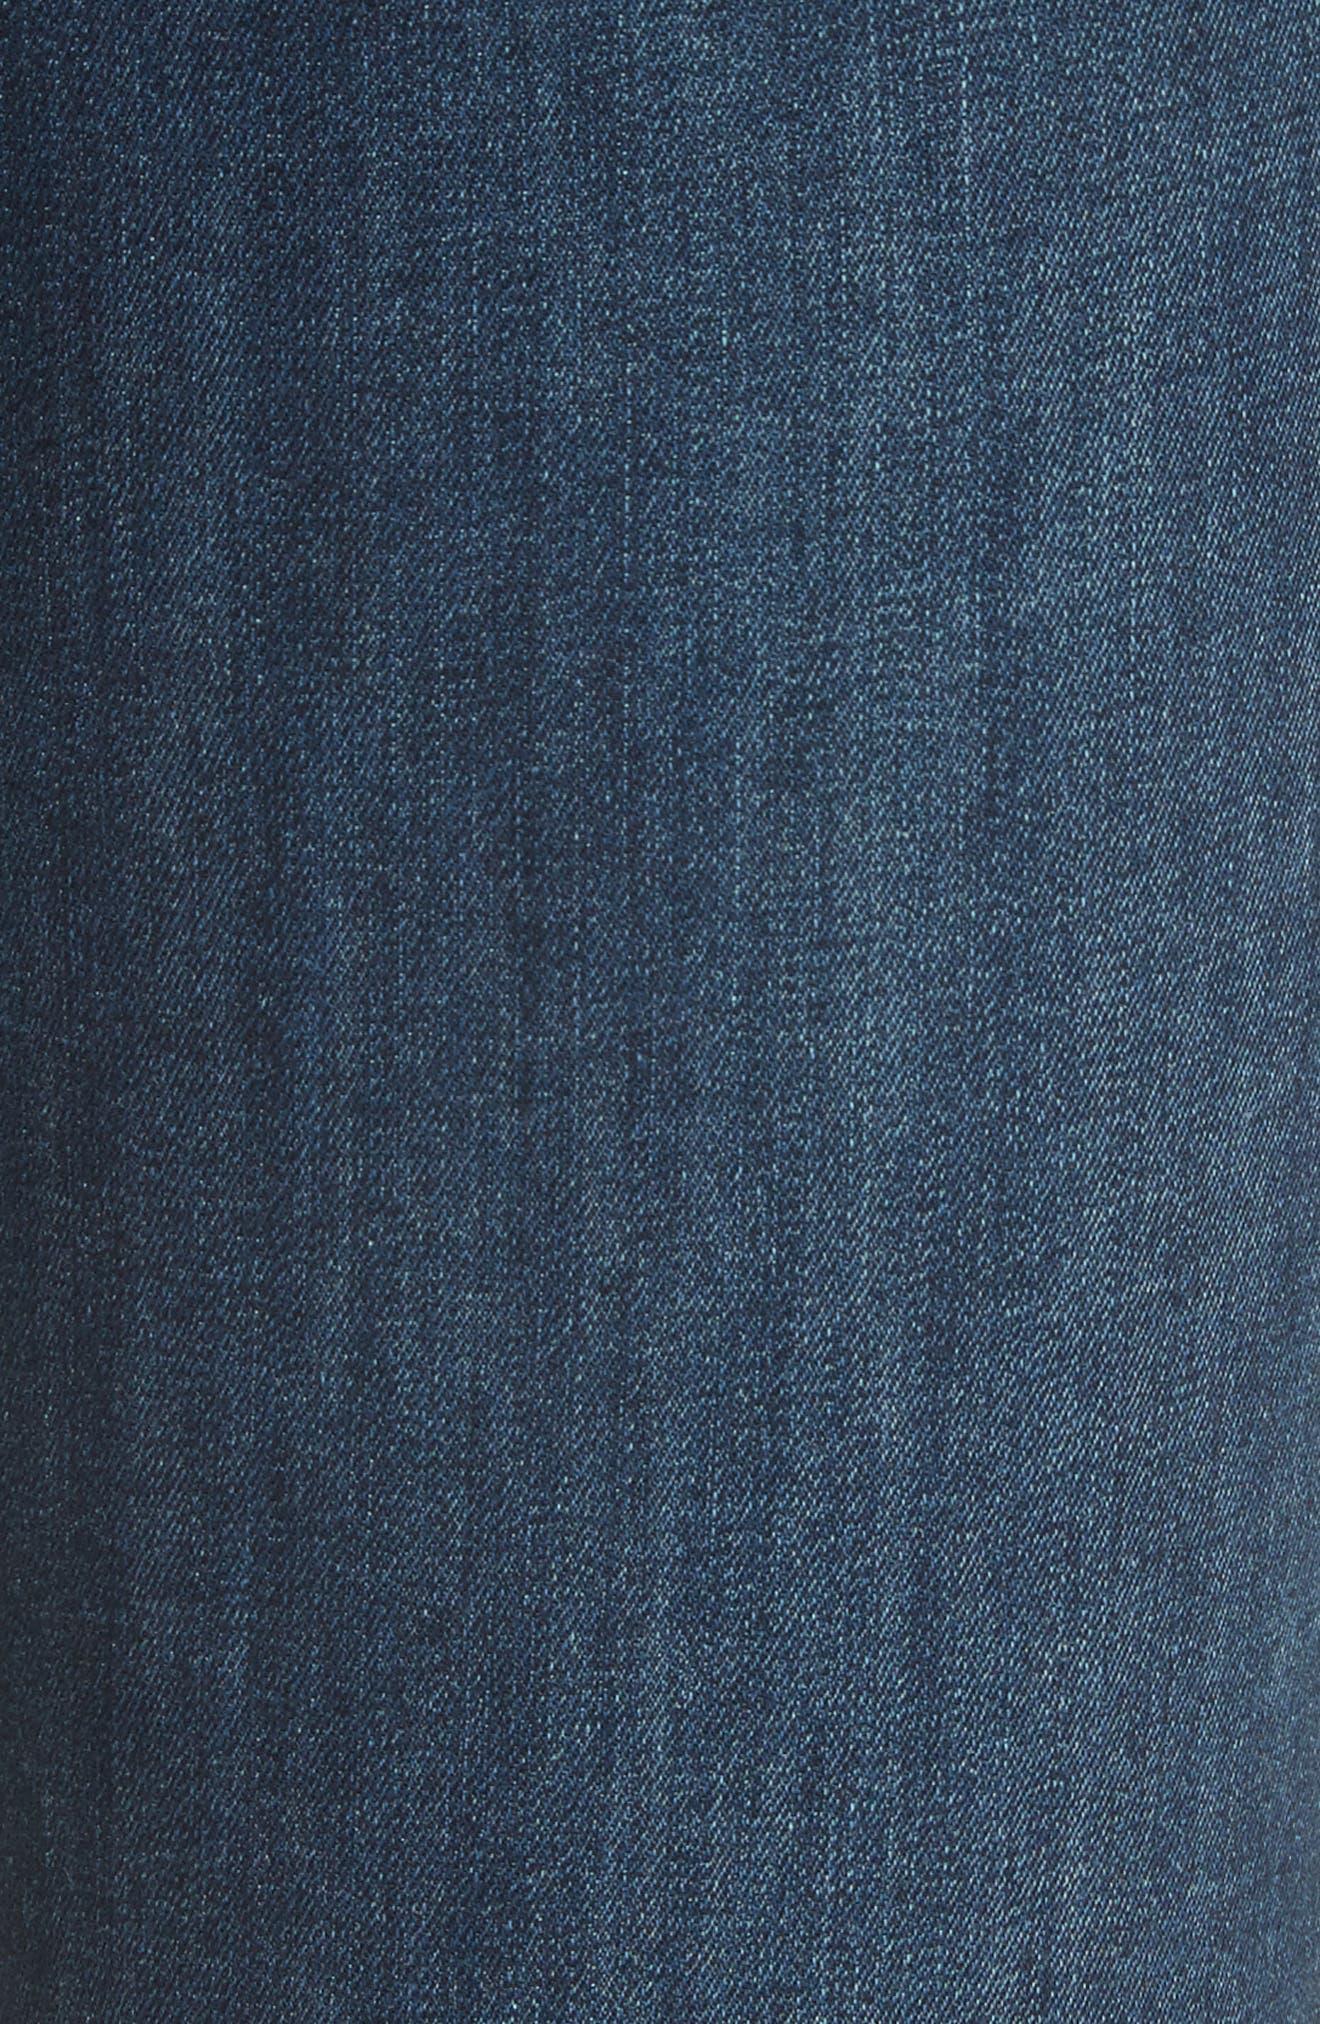 High Waist Ankle Skinny Jeans,                             Alternate thumbnail 6, color,                             Dark Blue